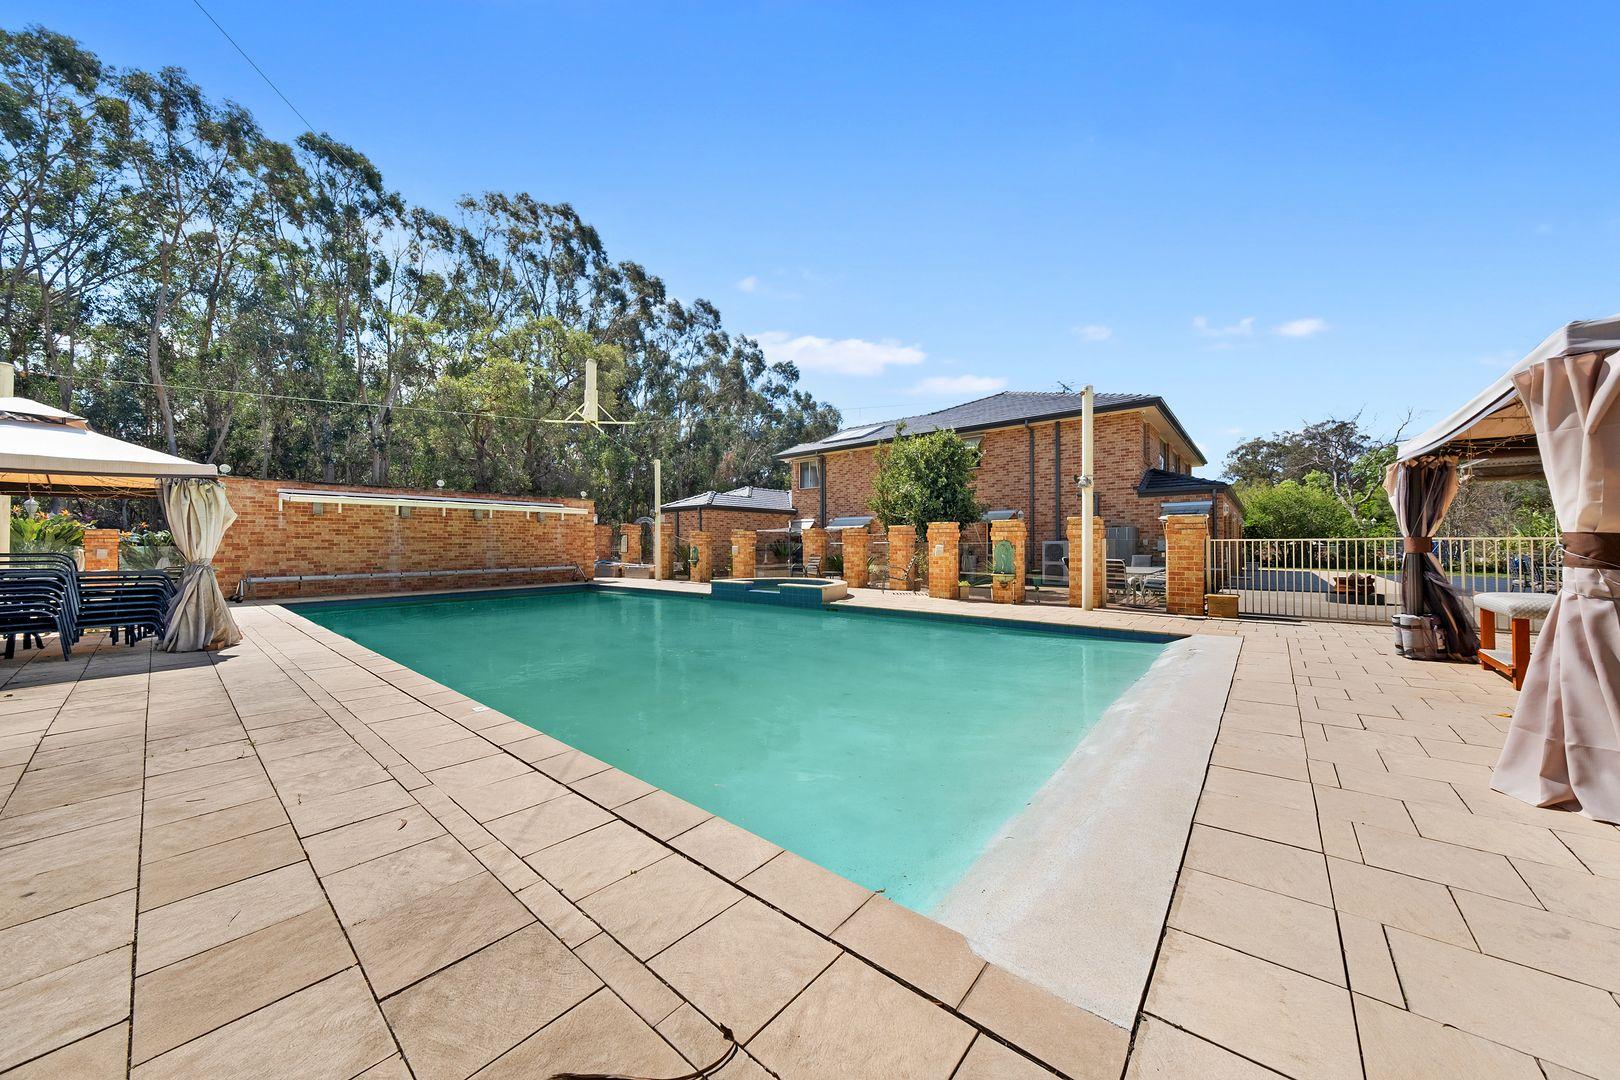 817-821 Castlereagh Road, Castlereagh NSW 2749, Image 2